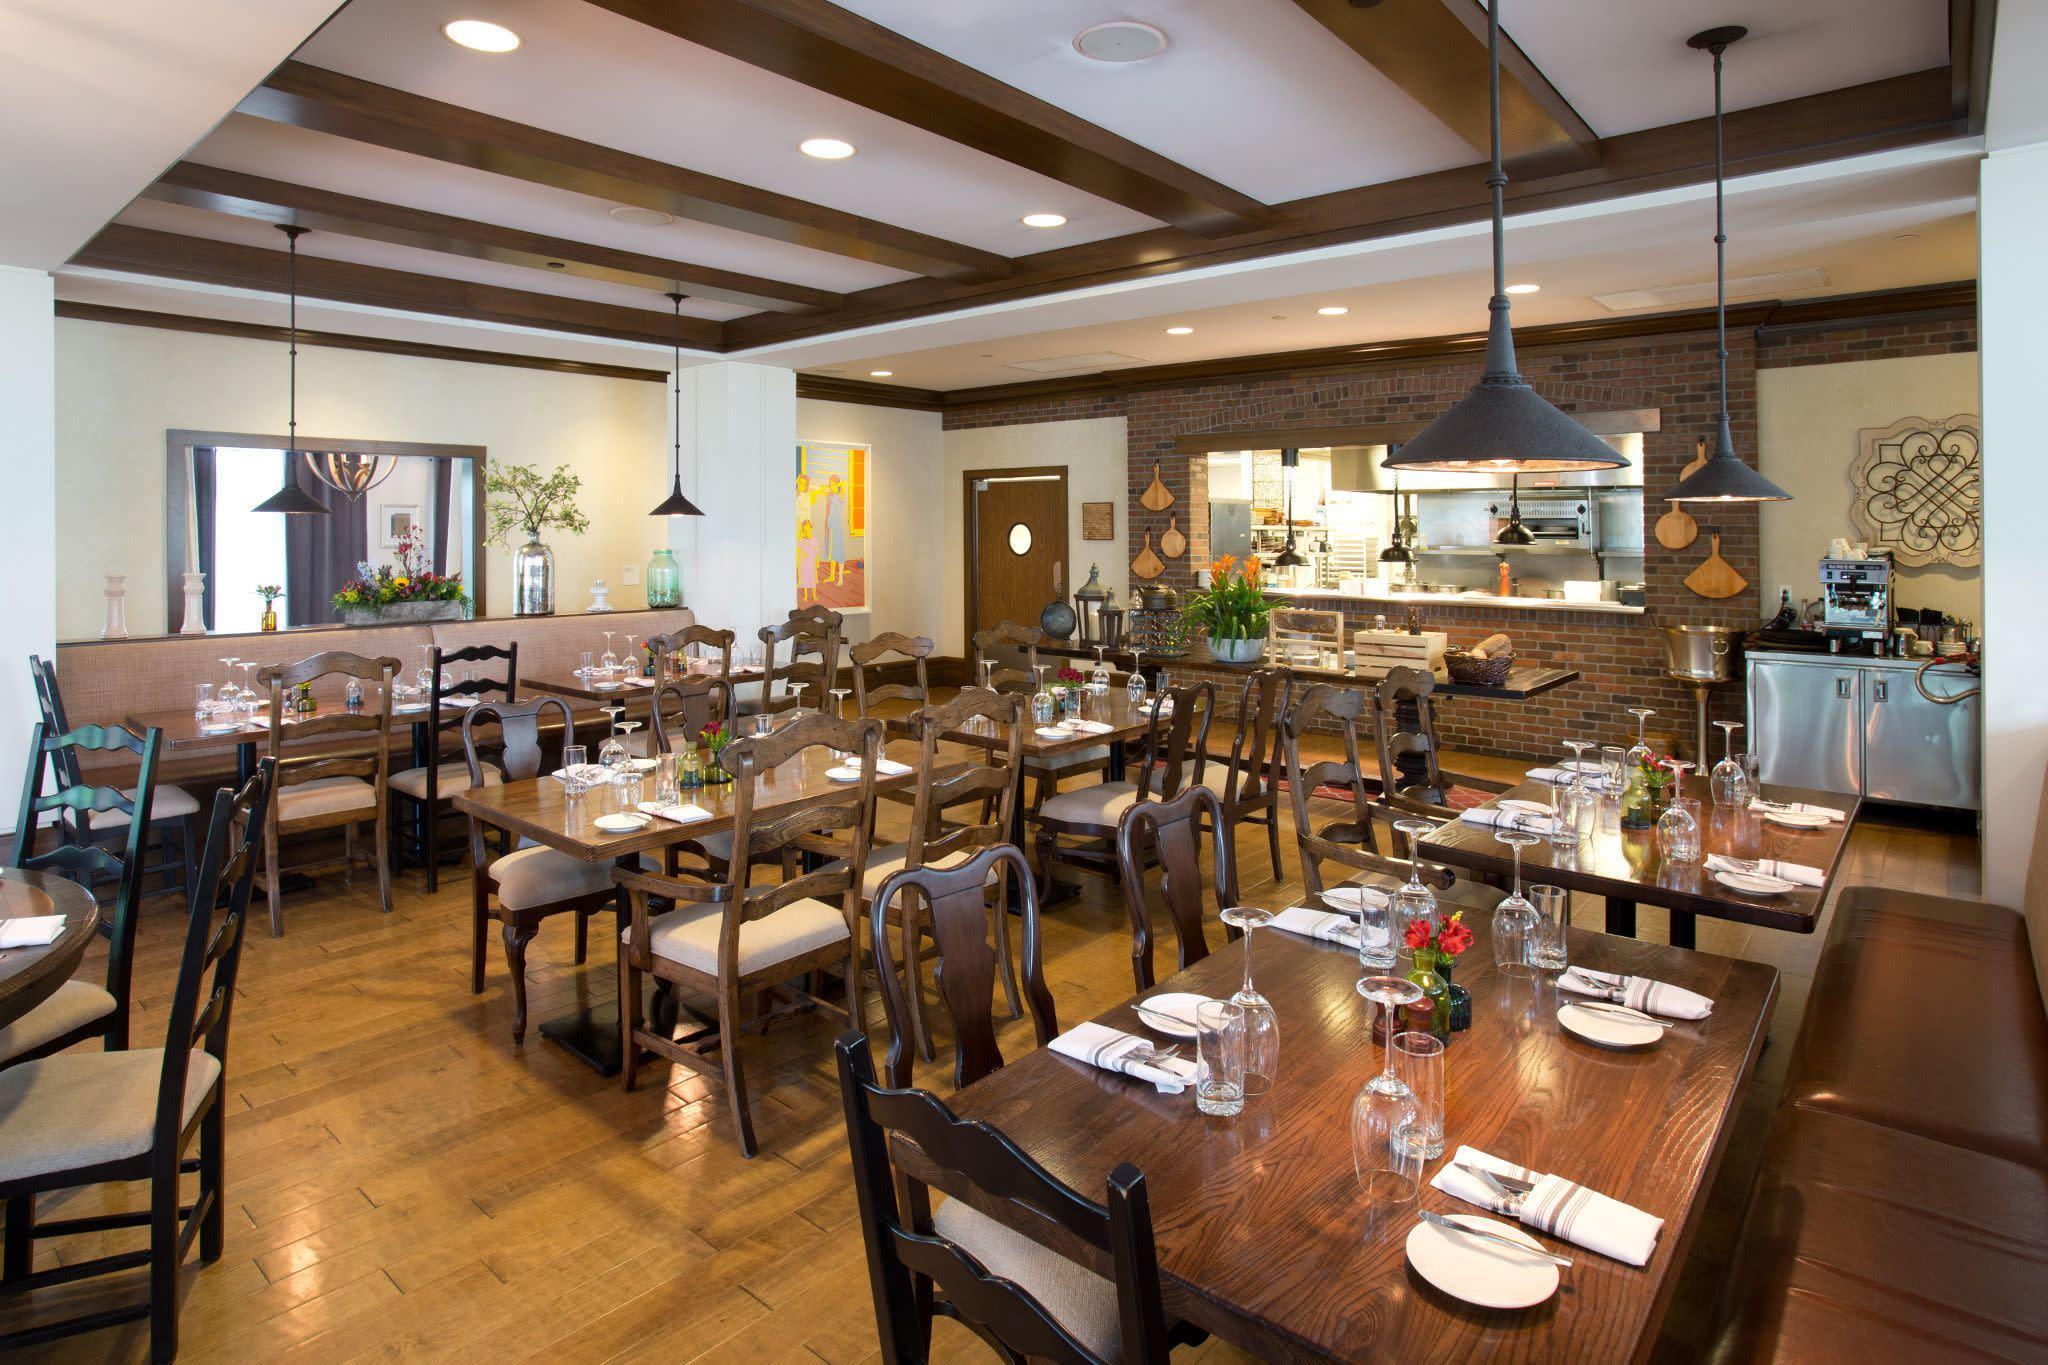 Hamilton's Kitchen in Winter Park near Orlando